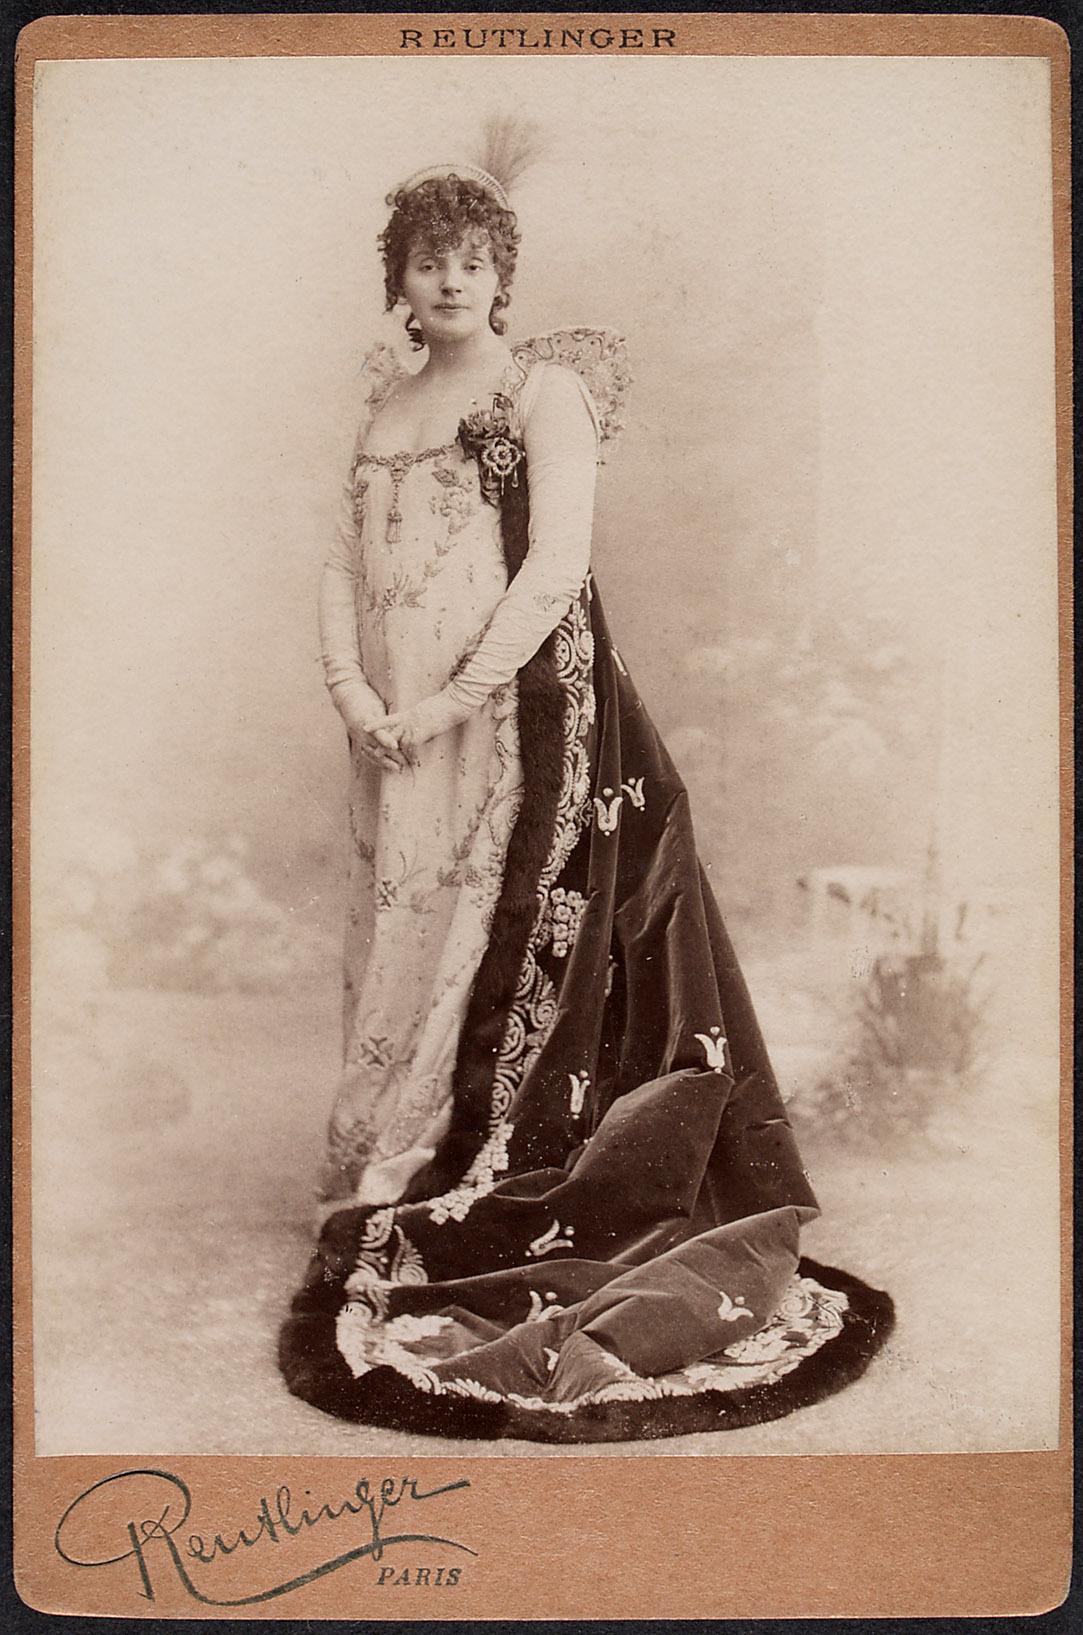 Gabrielle Rejane von Reutlinger, Paris